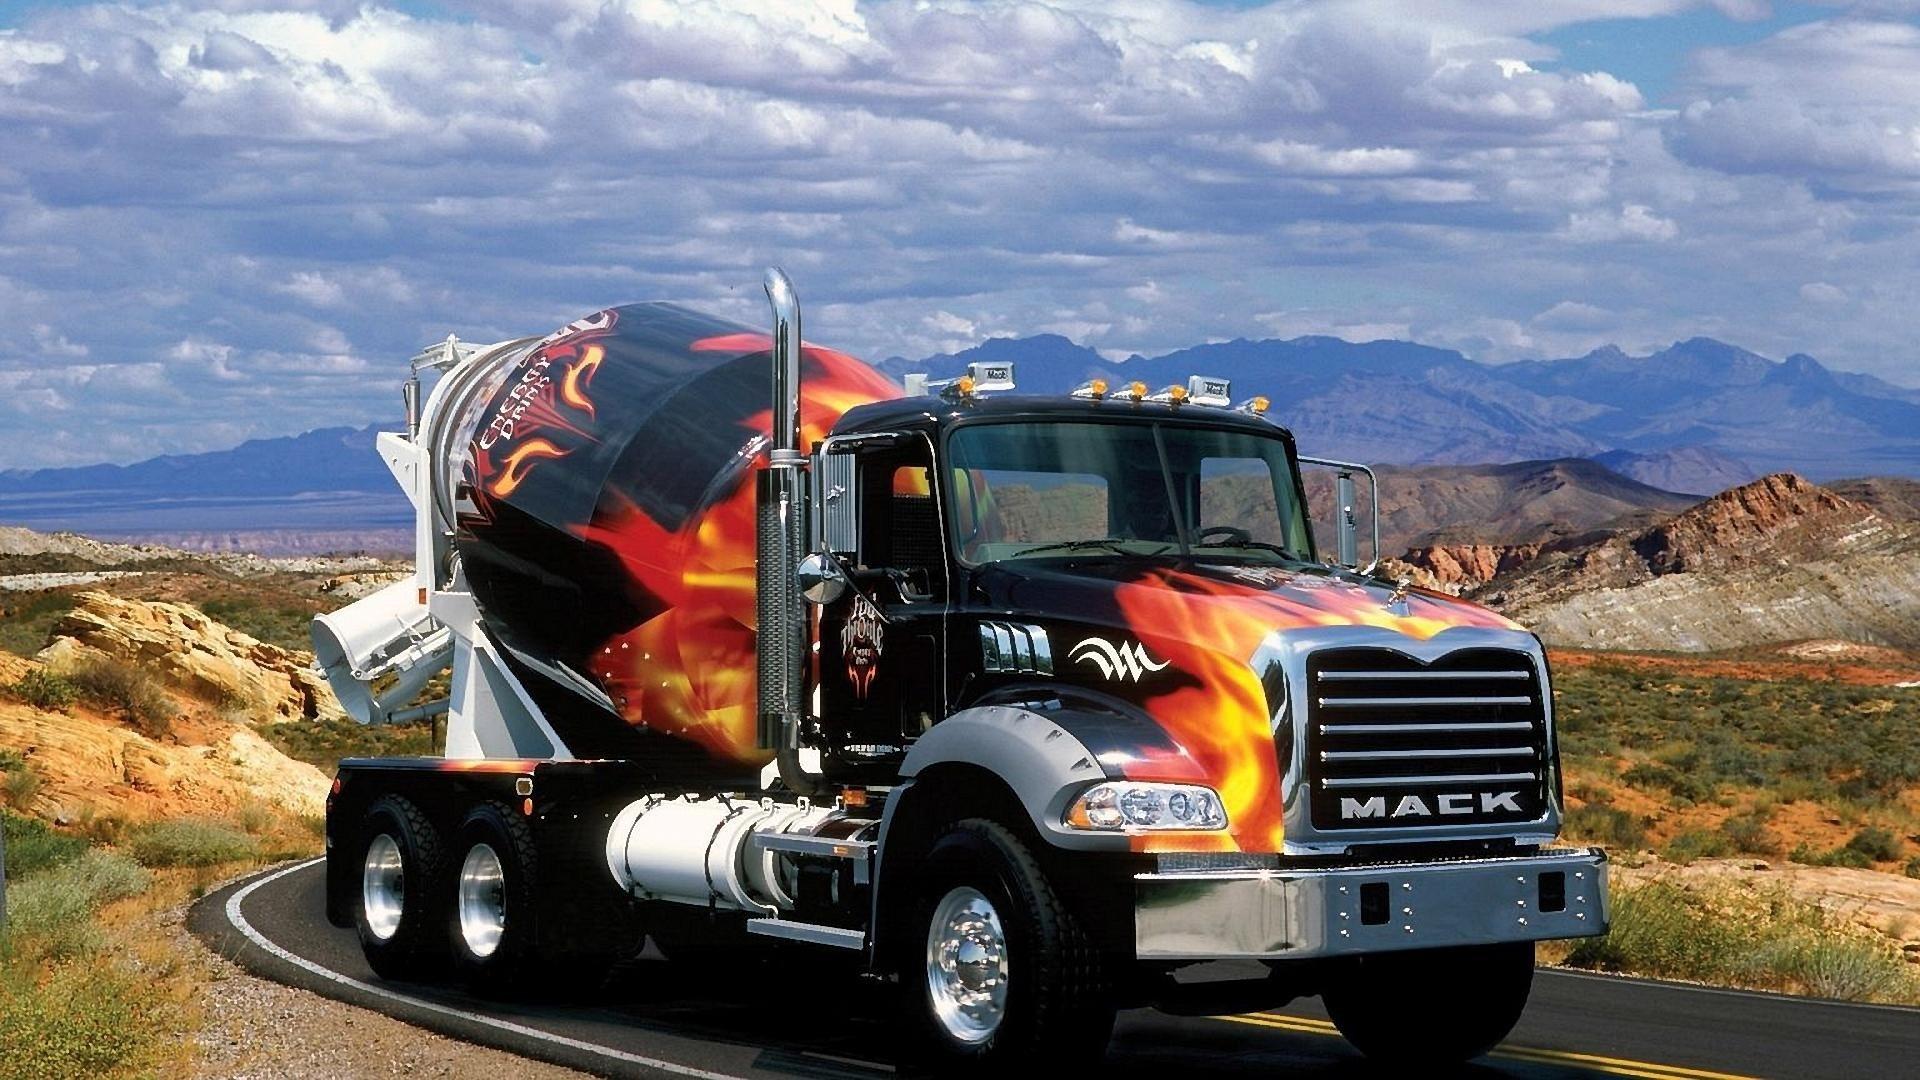 Truck Wallpaper for pc